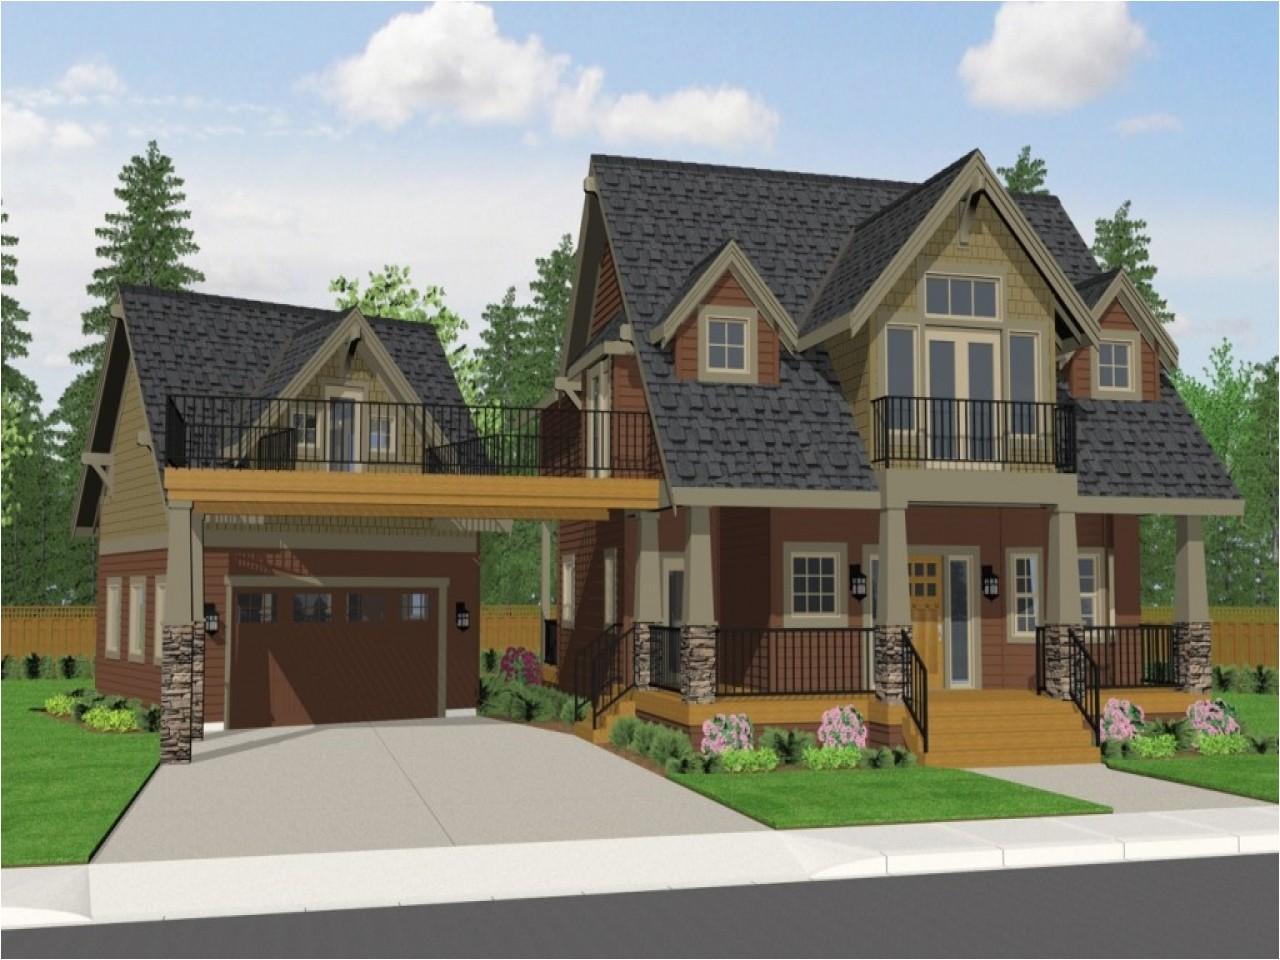 061b77b003df7f8a craftsman bungalow house plans craftsman style house plans